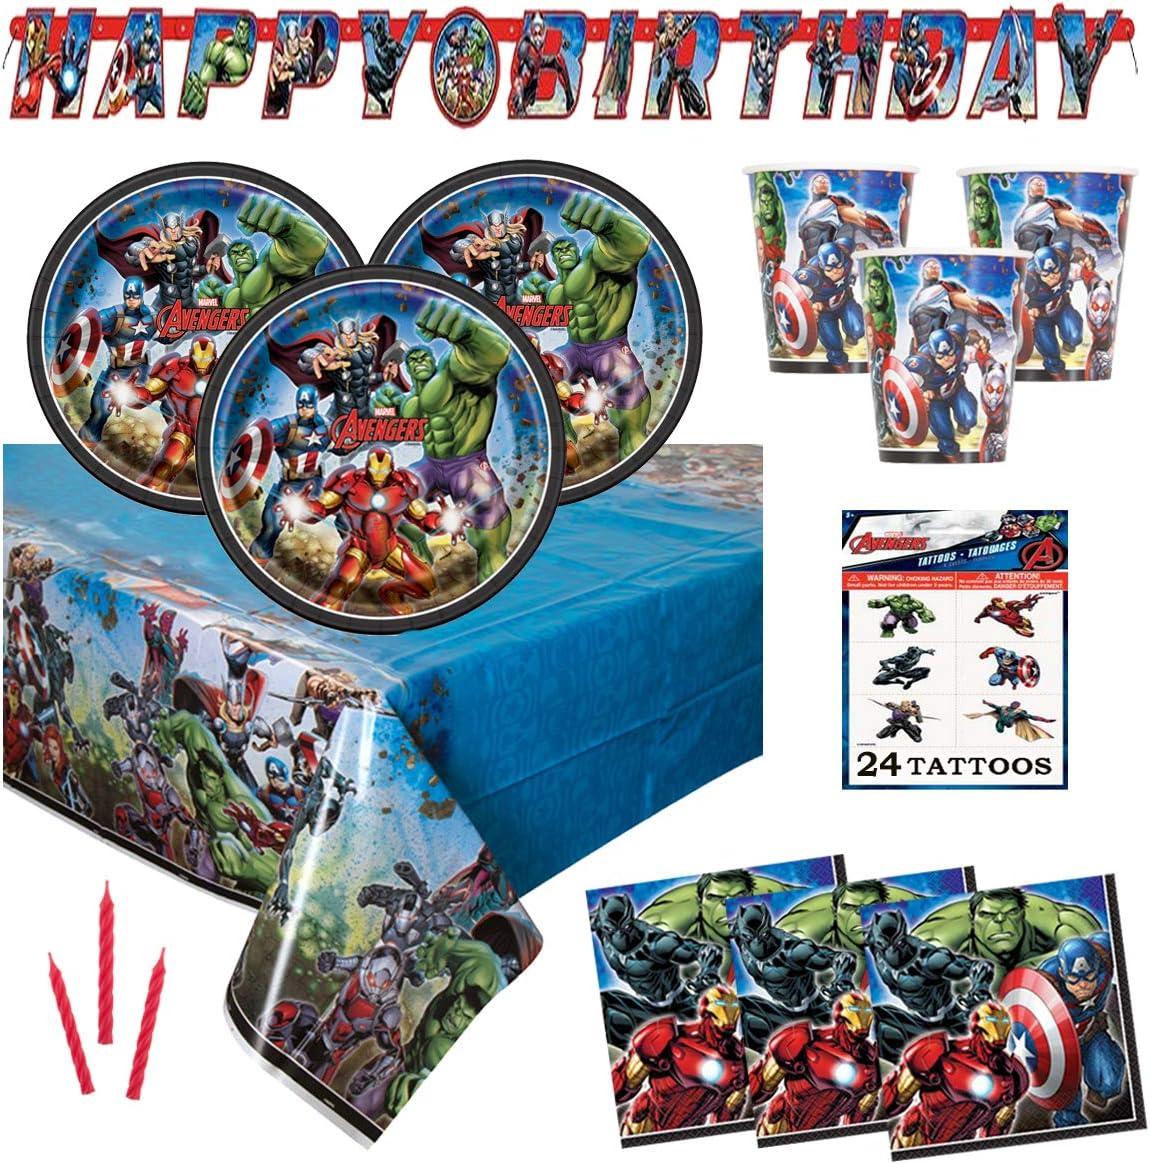 Superhero Birthday Party Decoration Happy Birthday Banner Avengers Aluminum Balloon Superhero Balloon Cake Toppers for Superhero Themem Party Supplies Superhero Avengers Party Decorations